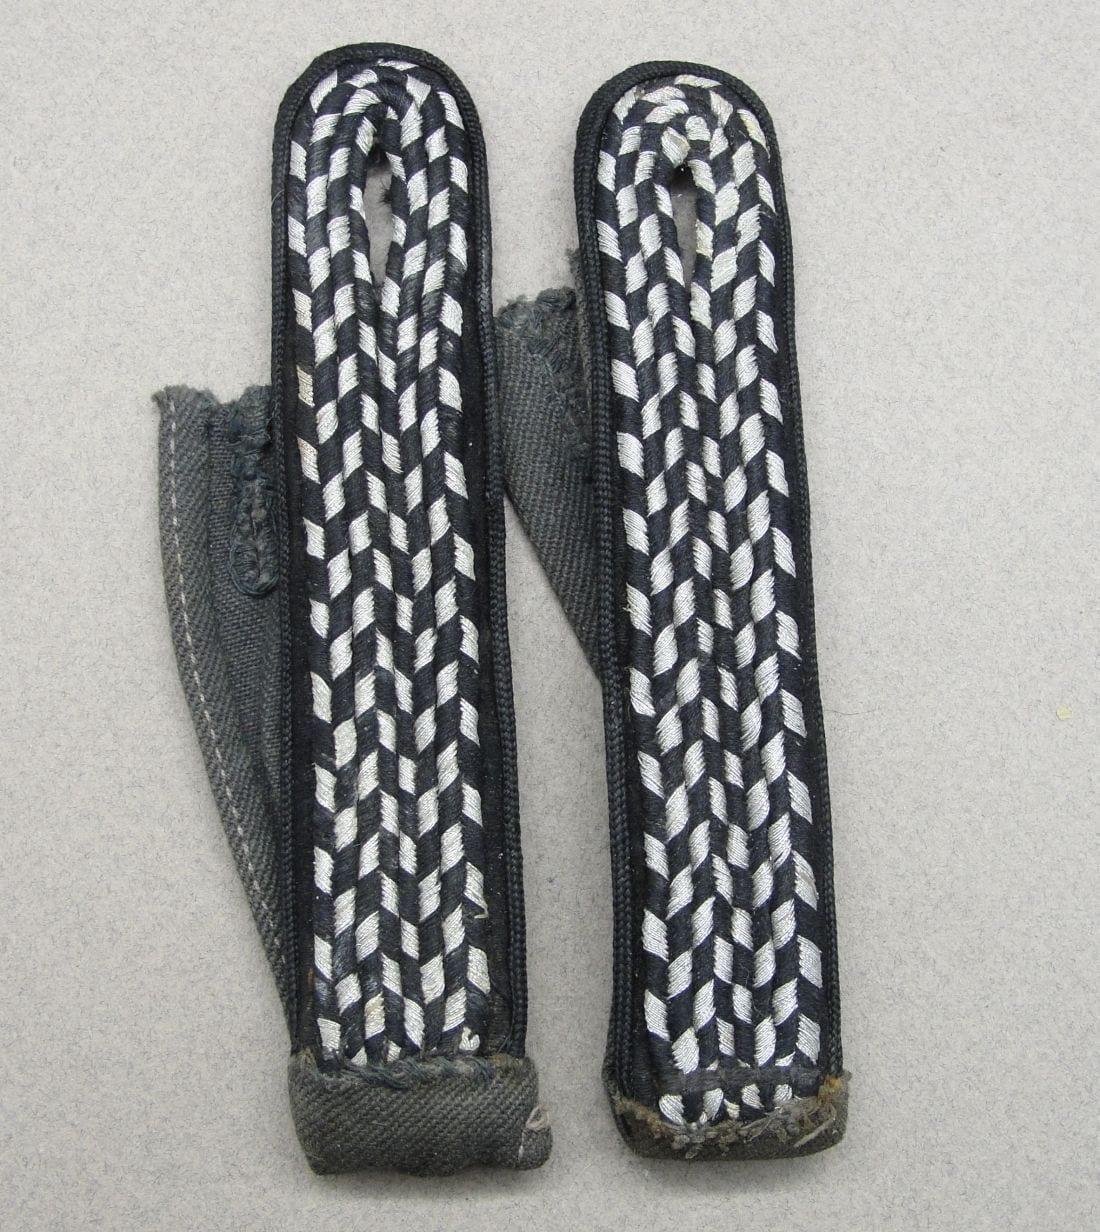 Pair of NSKK Shoulder Boards